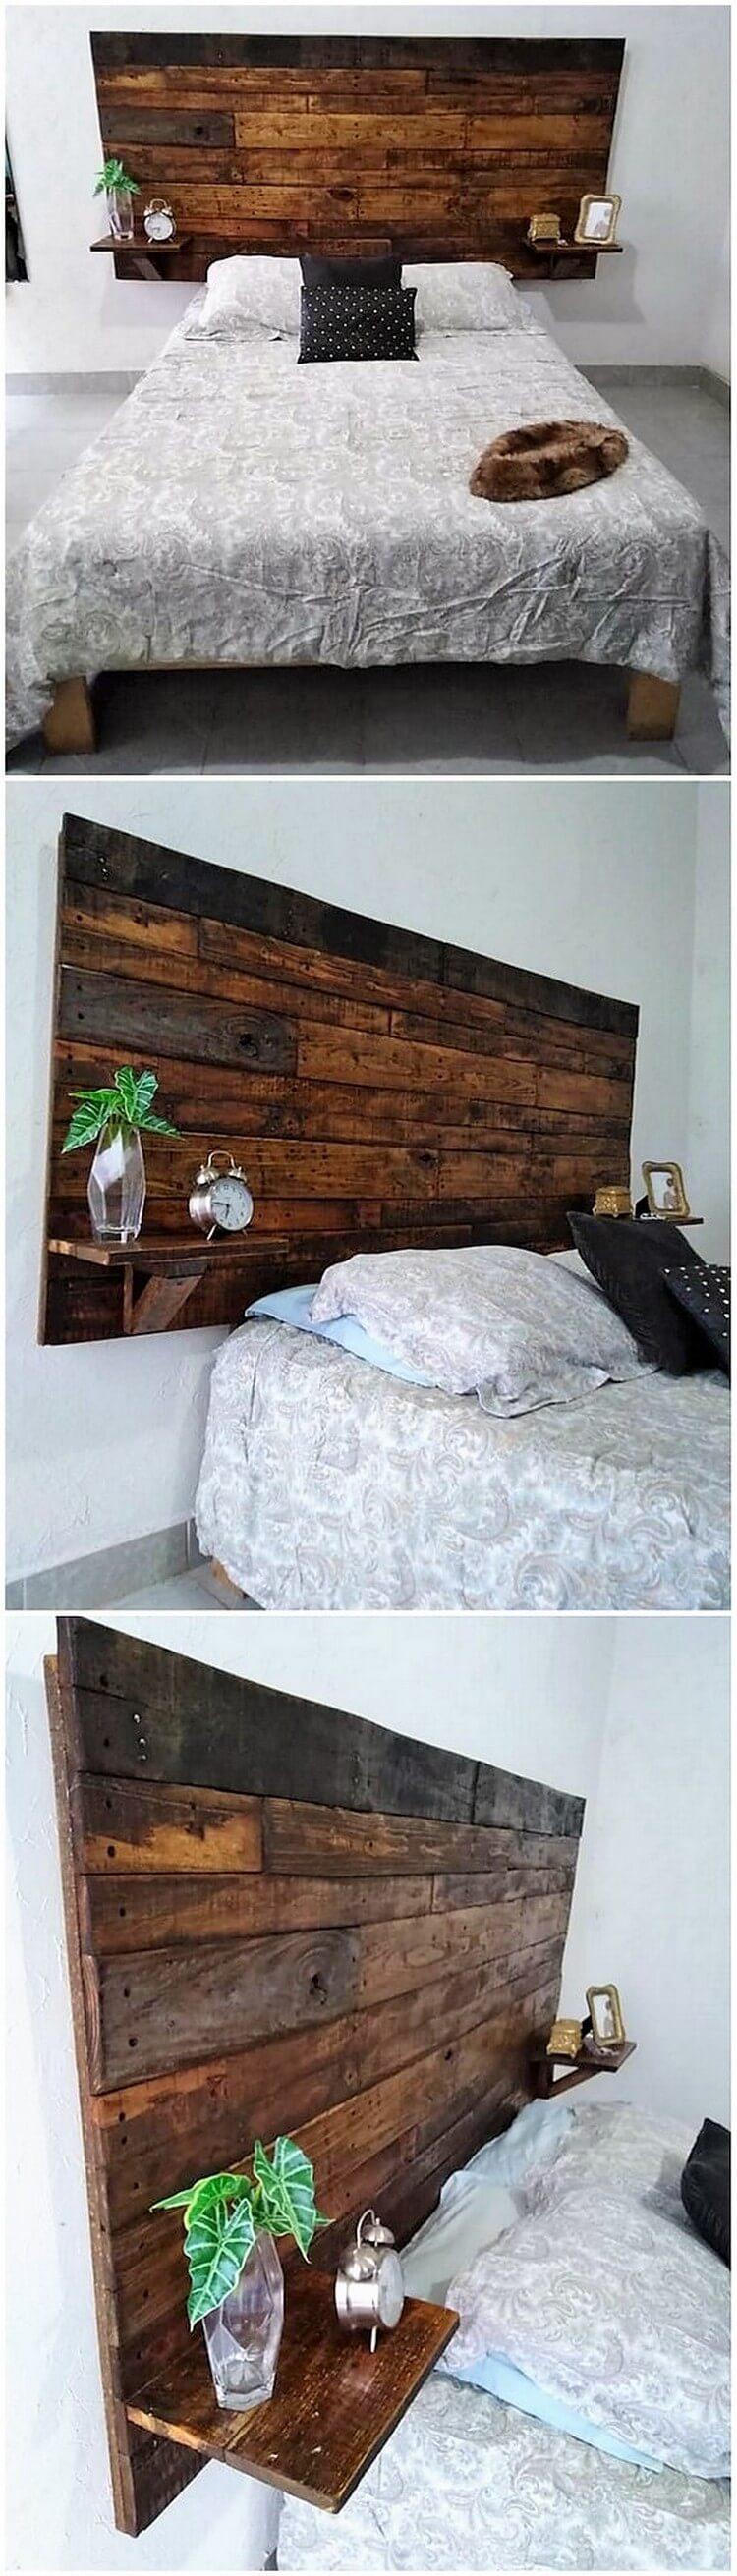 Pallet Bed Headboard